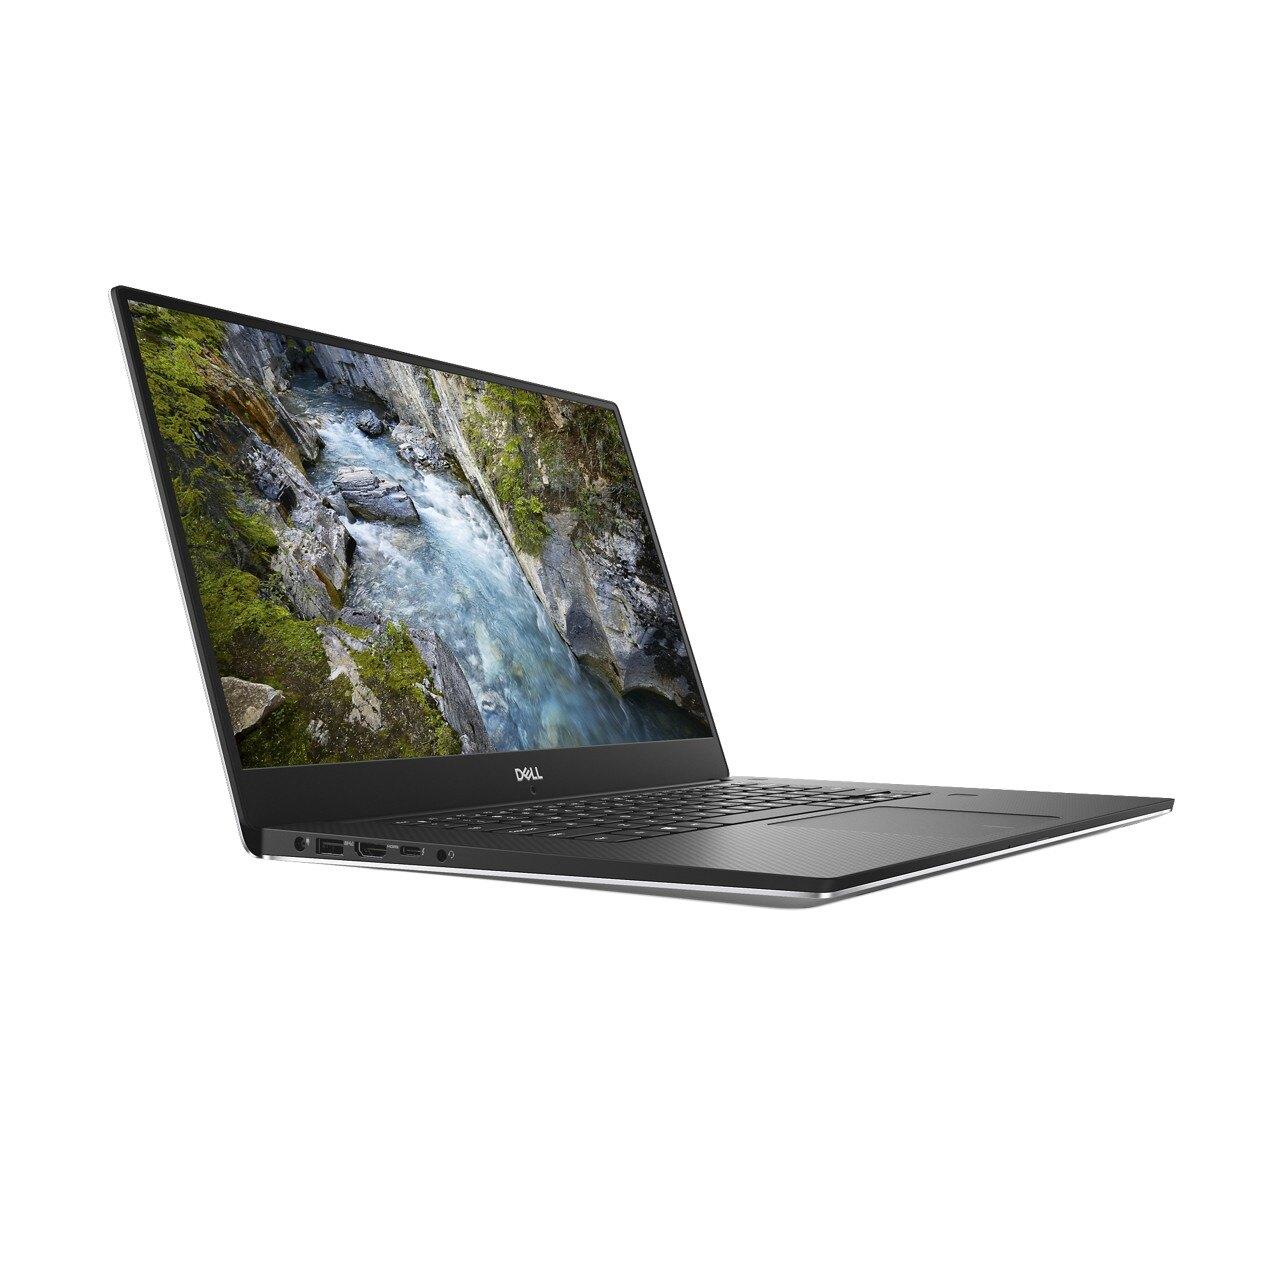 Dell XPS 15 9570 Laptop: i7-8750H, 16GB DDR4, 512GB SSD, 1050 Ti 4GB +$349.75 back in Rakuten points $1399.99